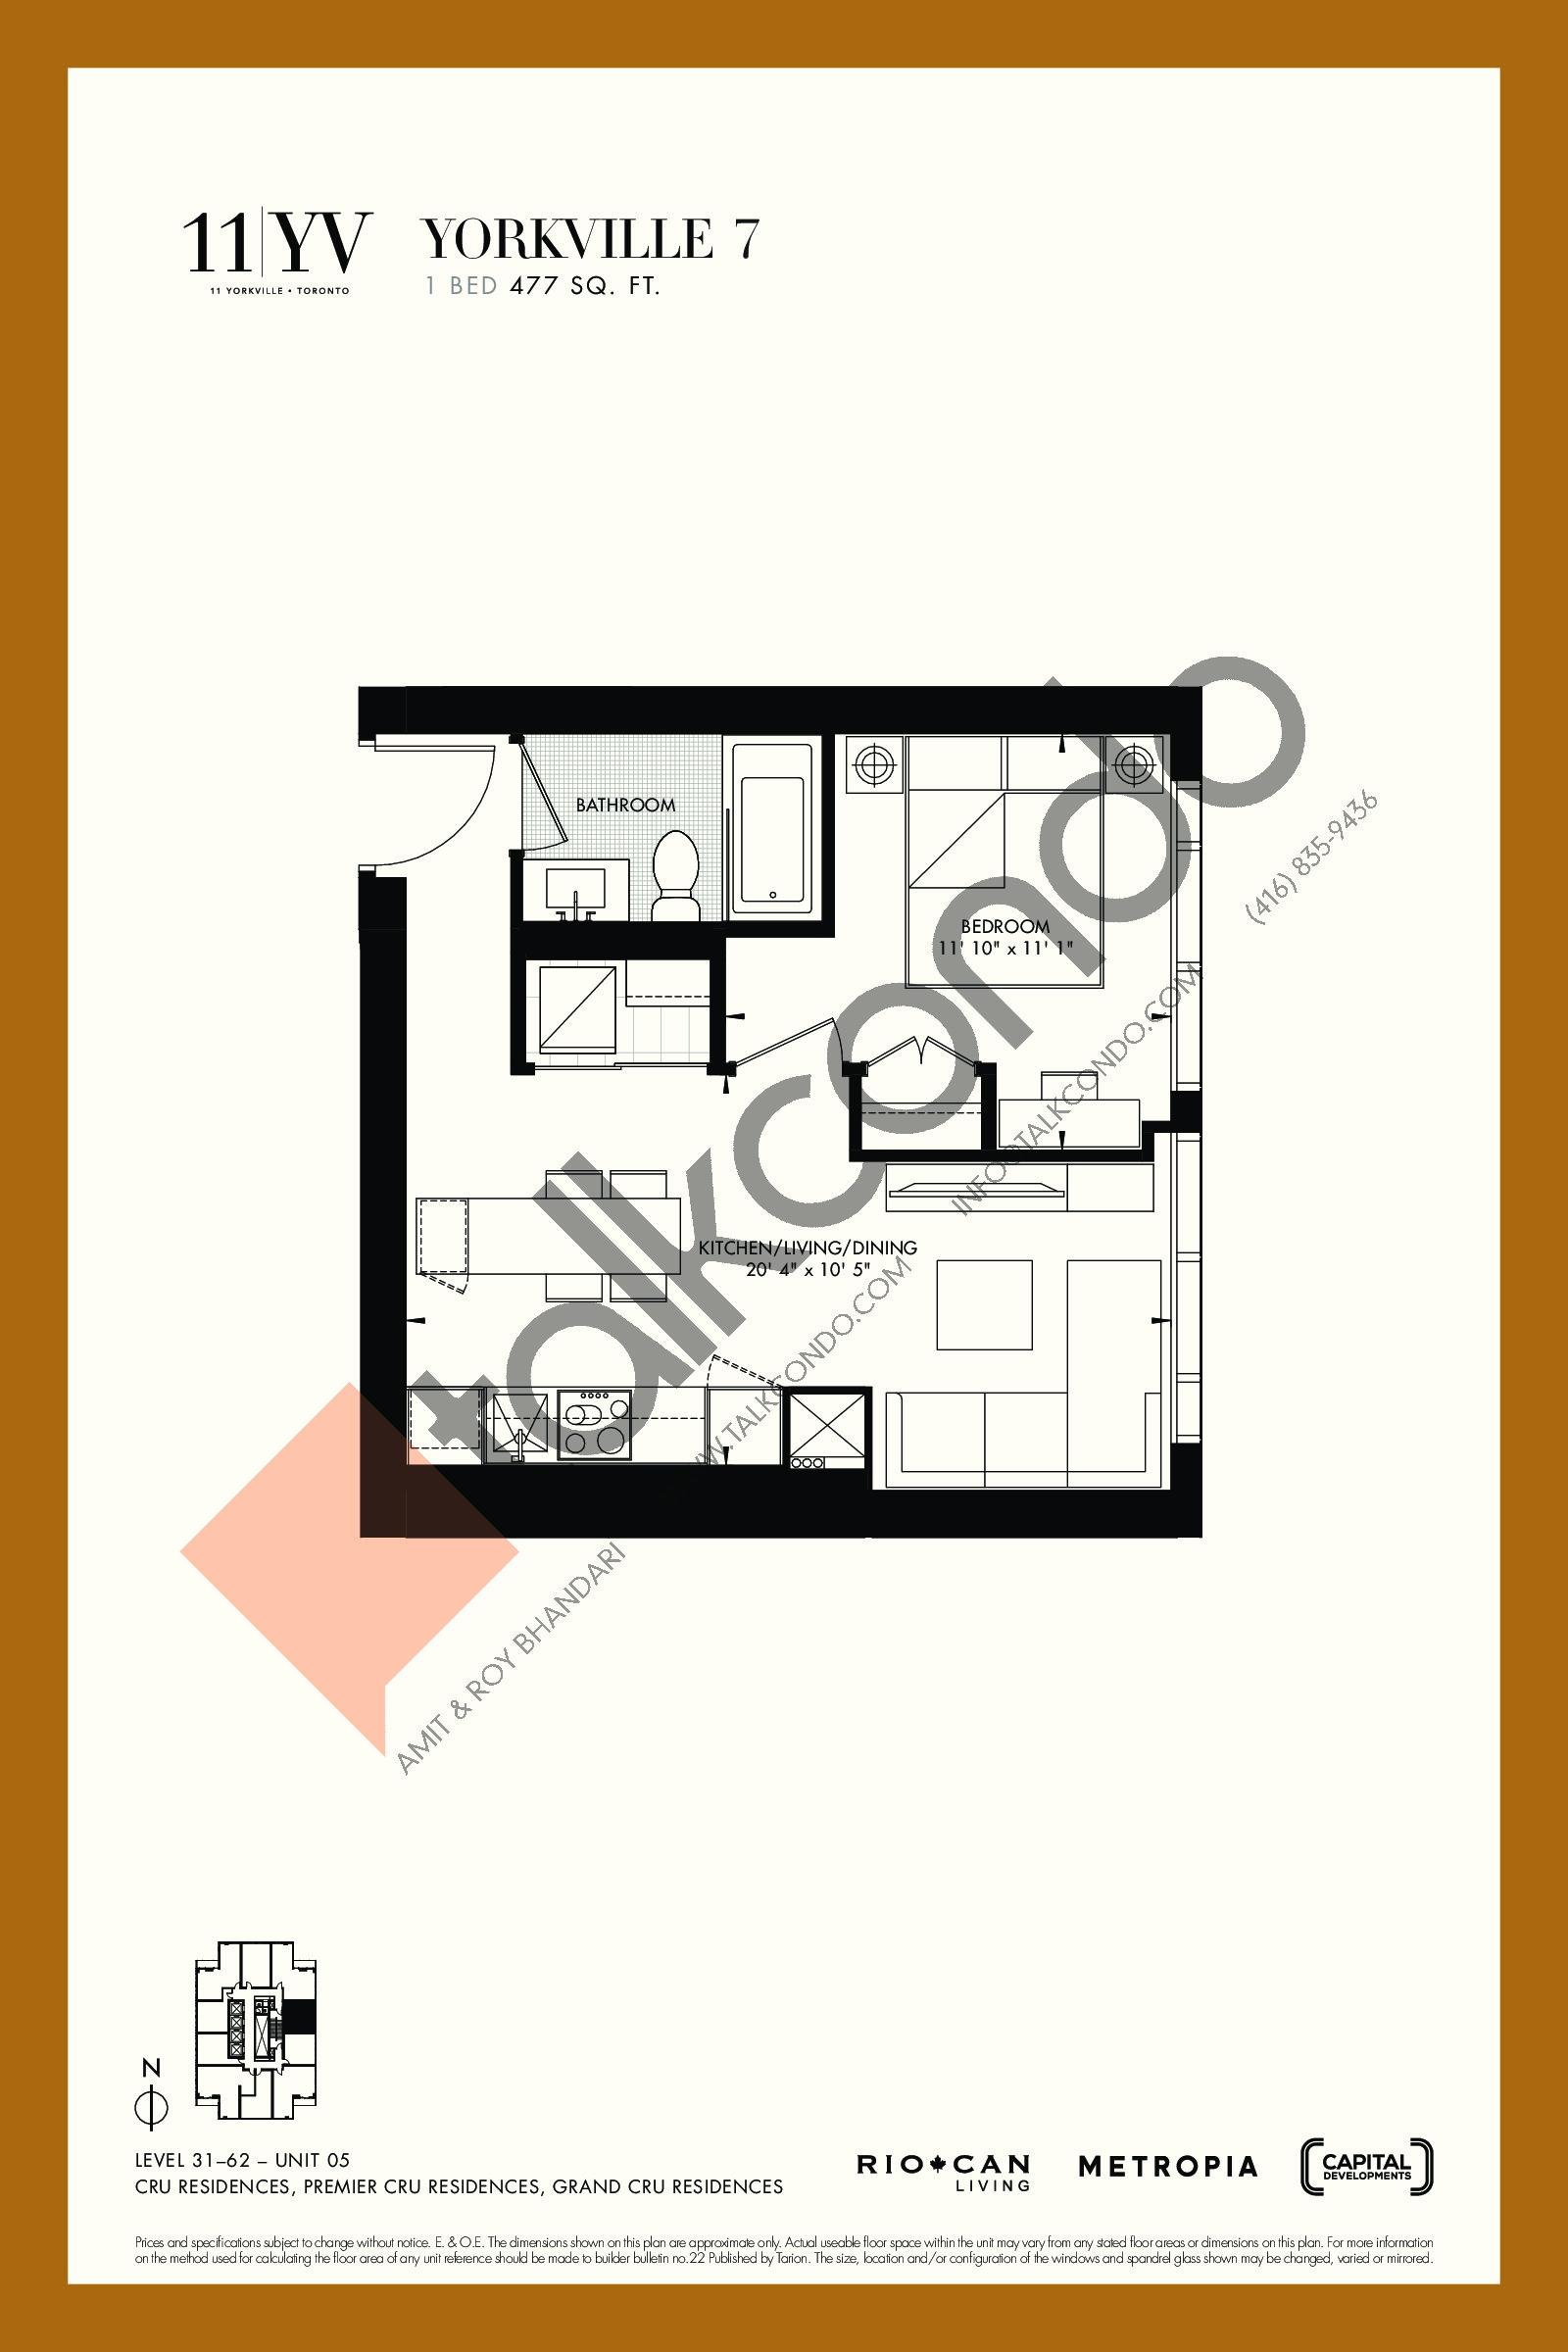 Yorkville 7 Floor Plan at 11YV Condos - 477 sq.ft